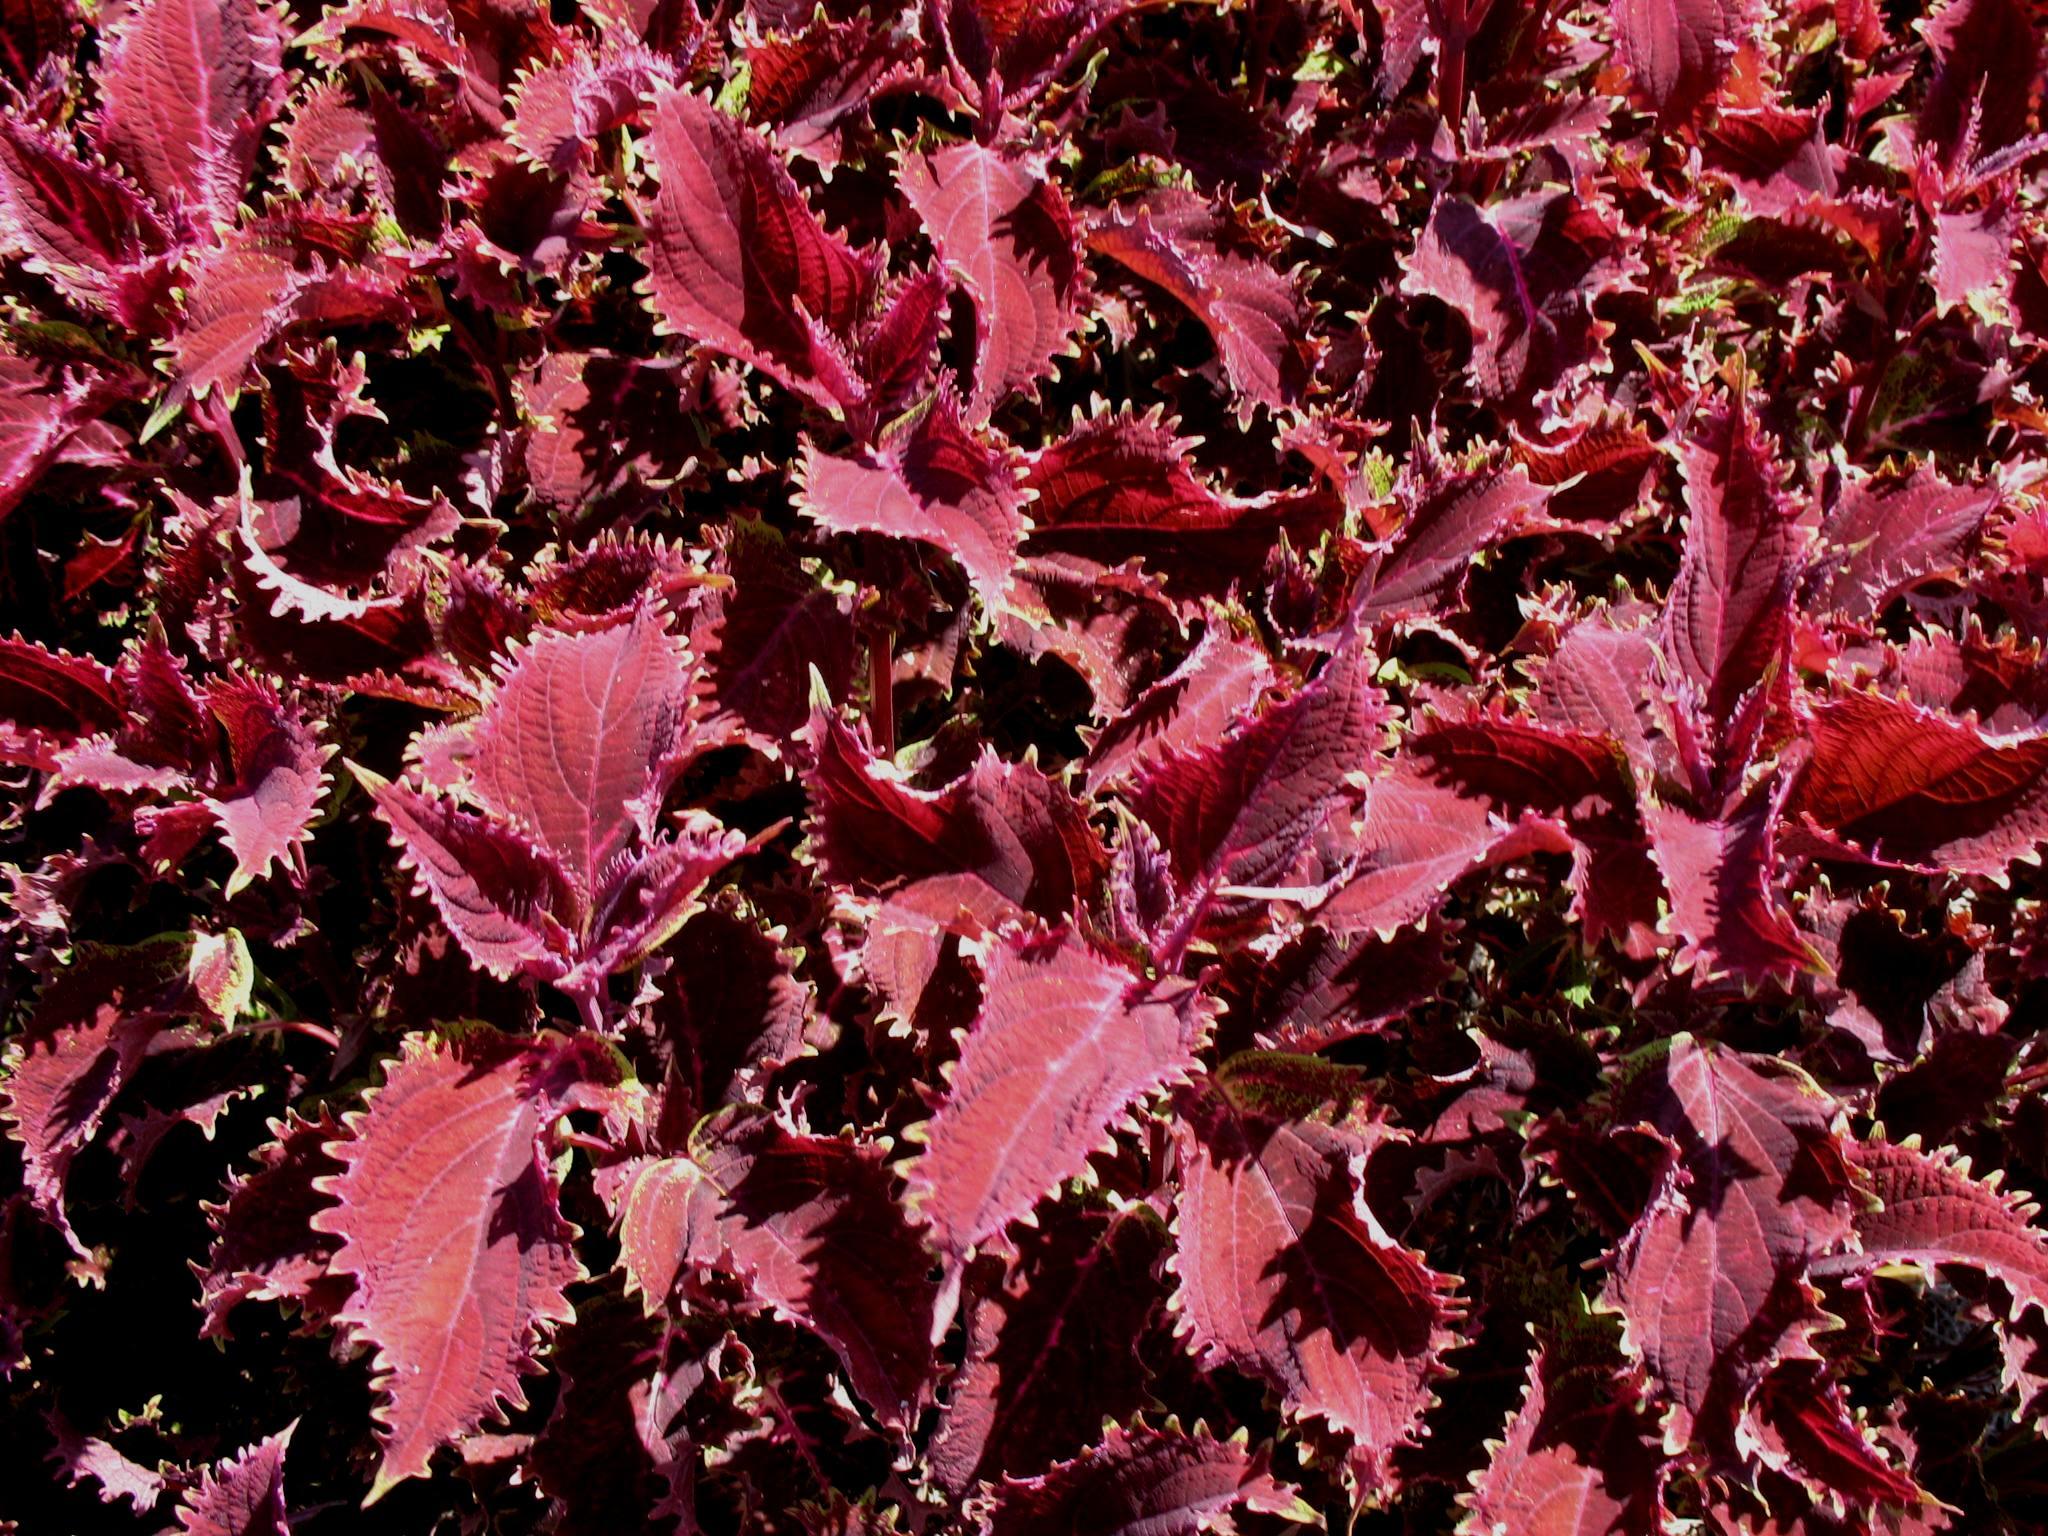 Solenostemon scutellarioides 'Red Ruffles'   / Solenostemon scutellarioides 'Red Ruffles'